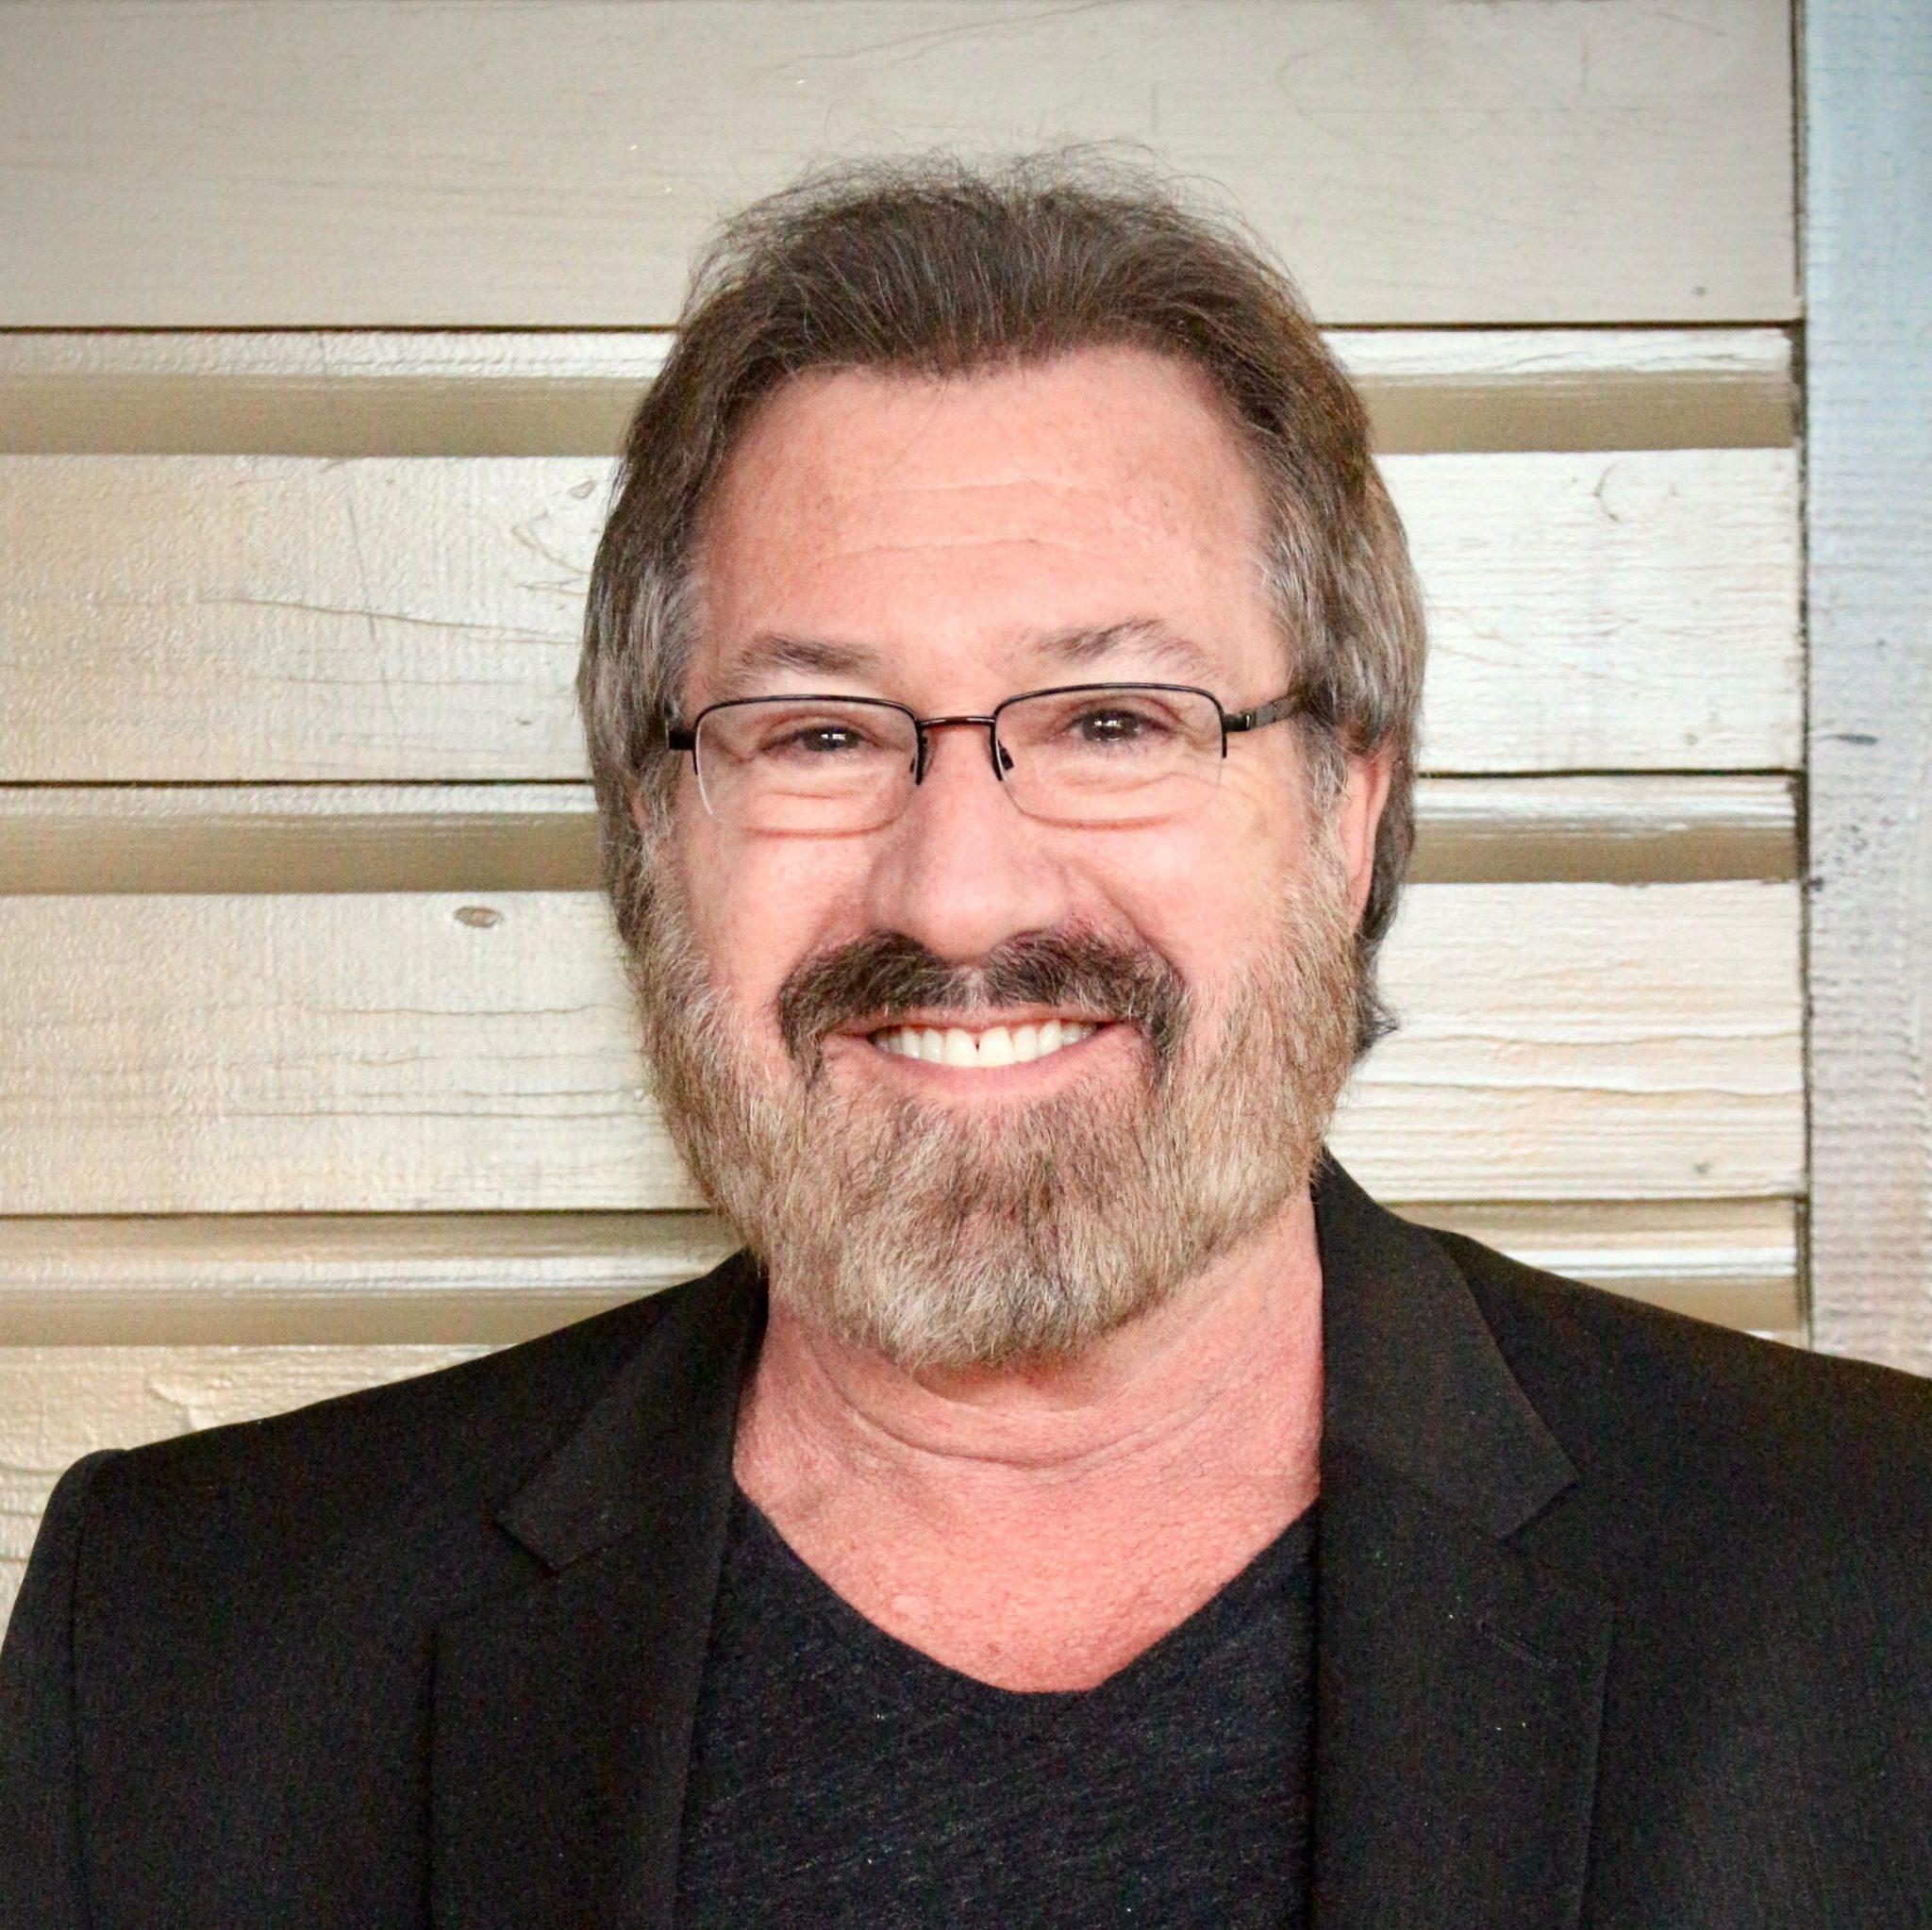 Rick Pearl, LCSW, LPC, NCC